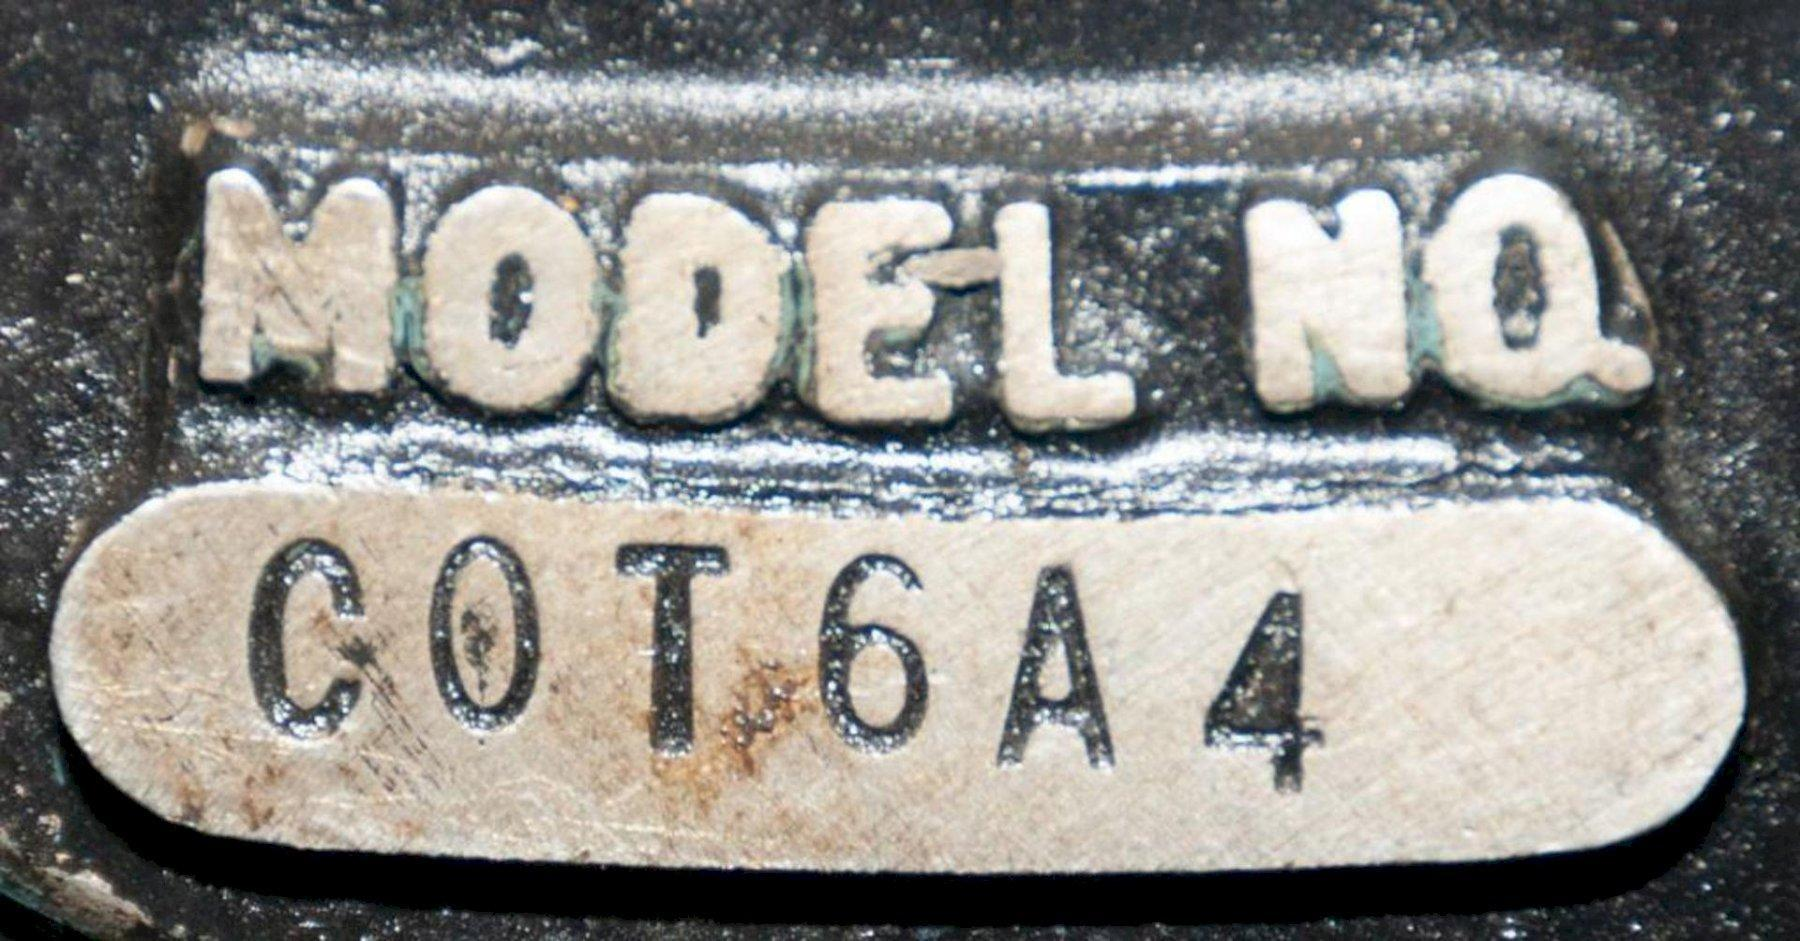 TISHKEN MODEL #COR6A4 6-WAY ADJUSTABLE CUTOFF PRESS: STOCK #0950621